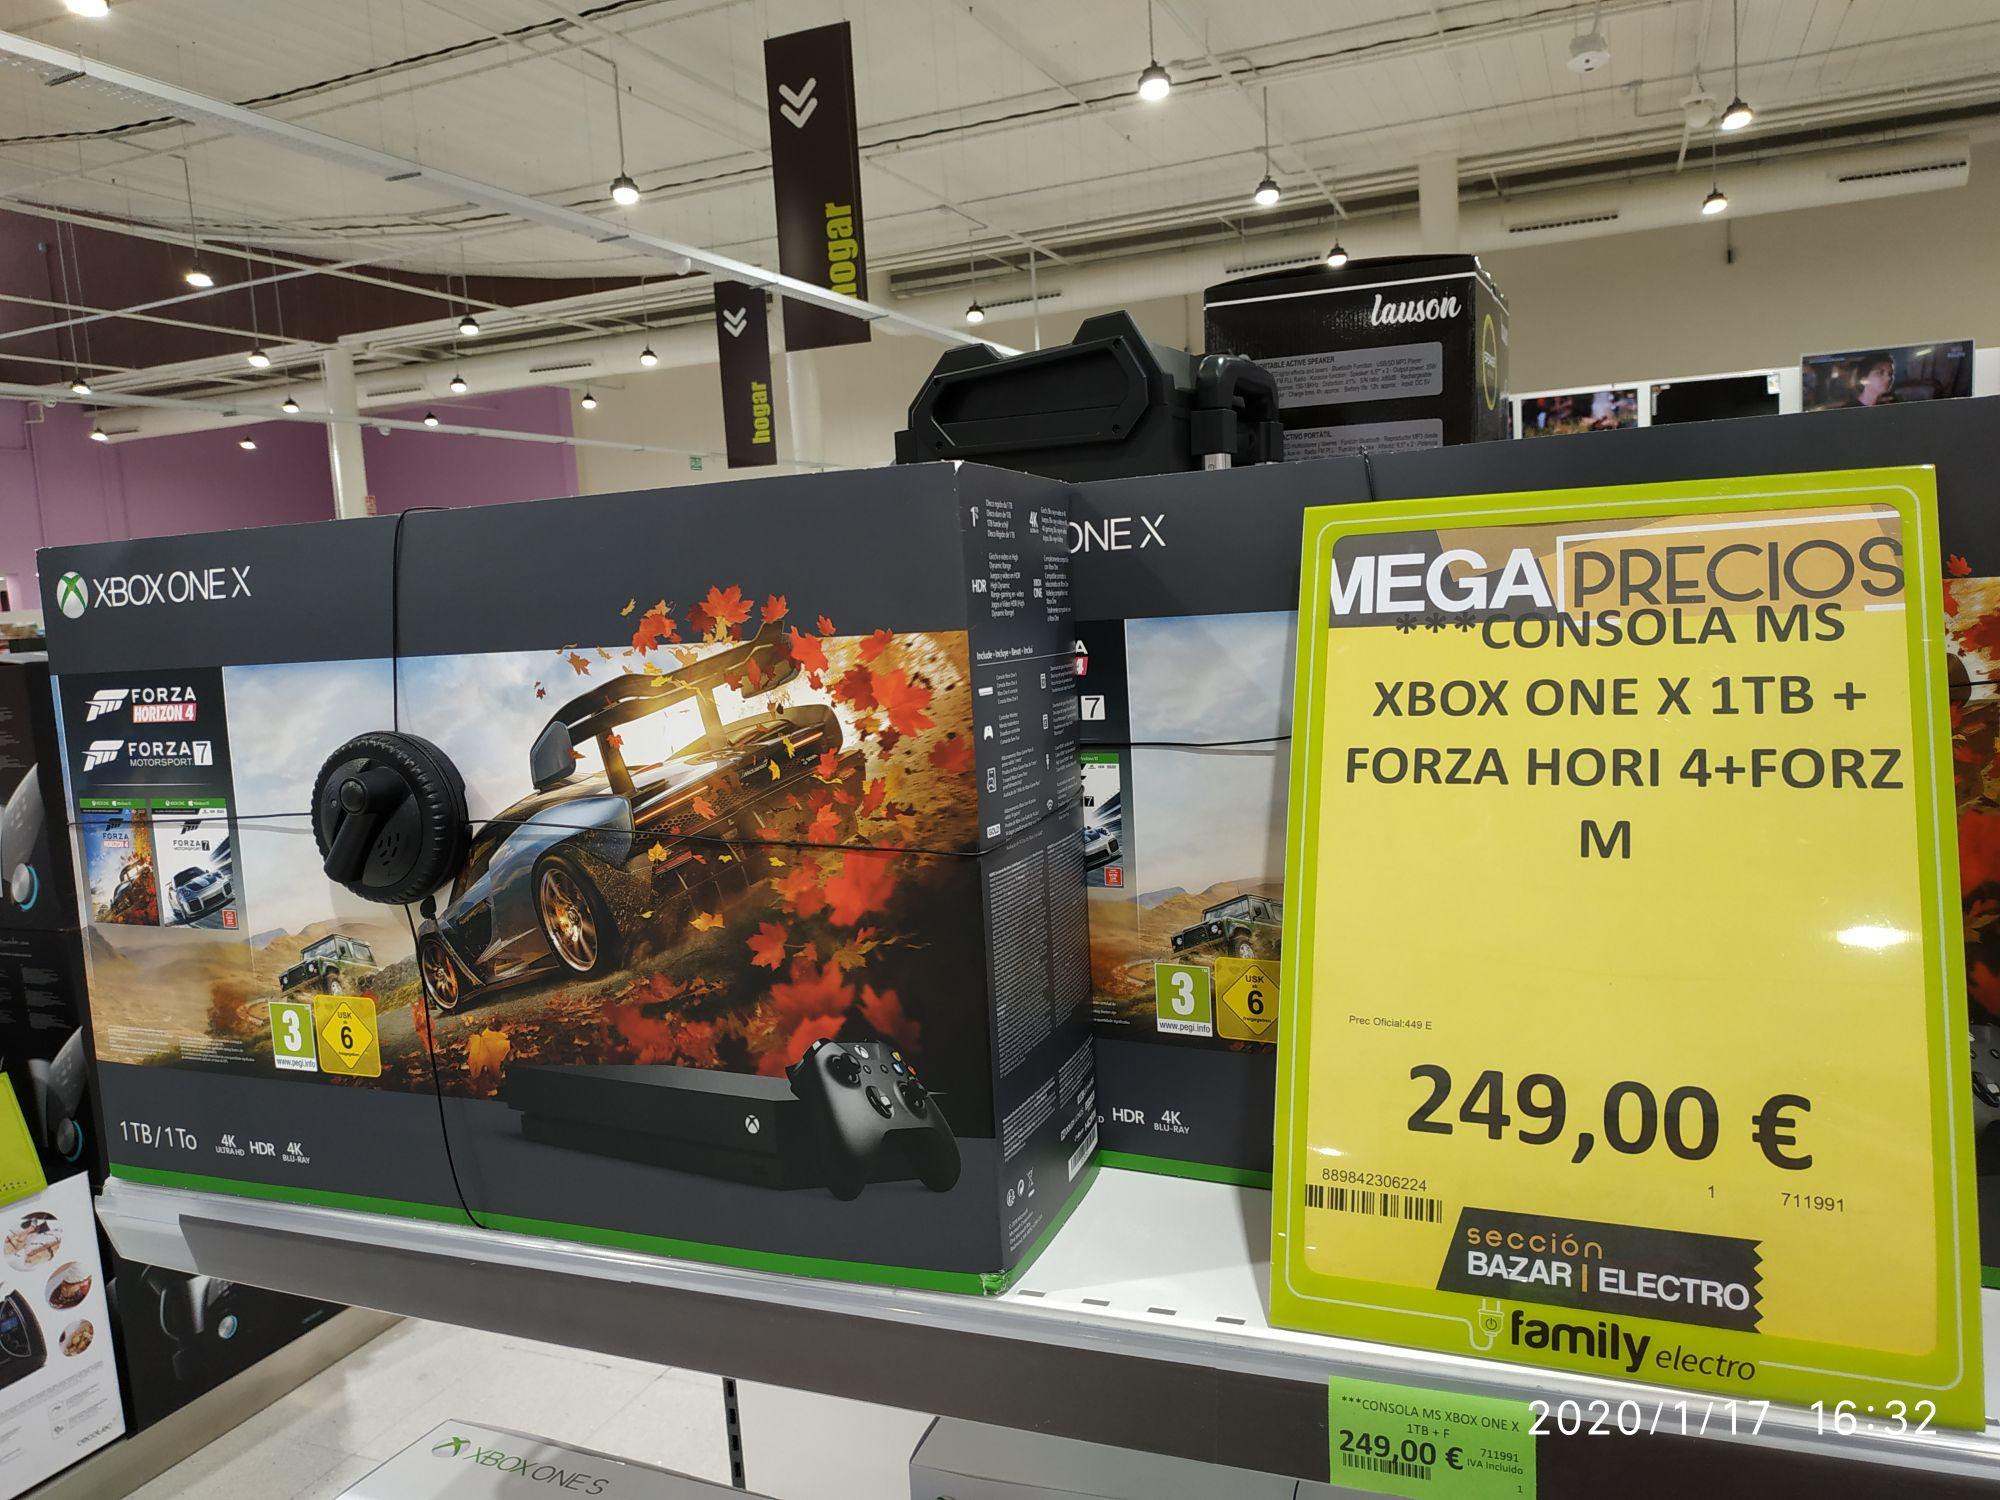 Xbox one x más Forza Horizon